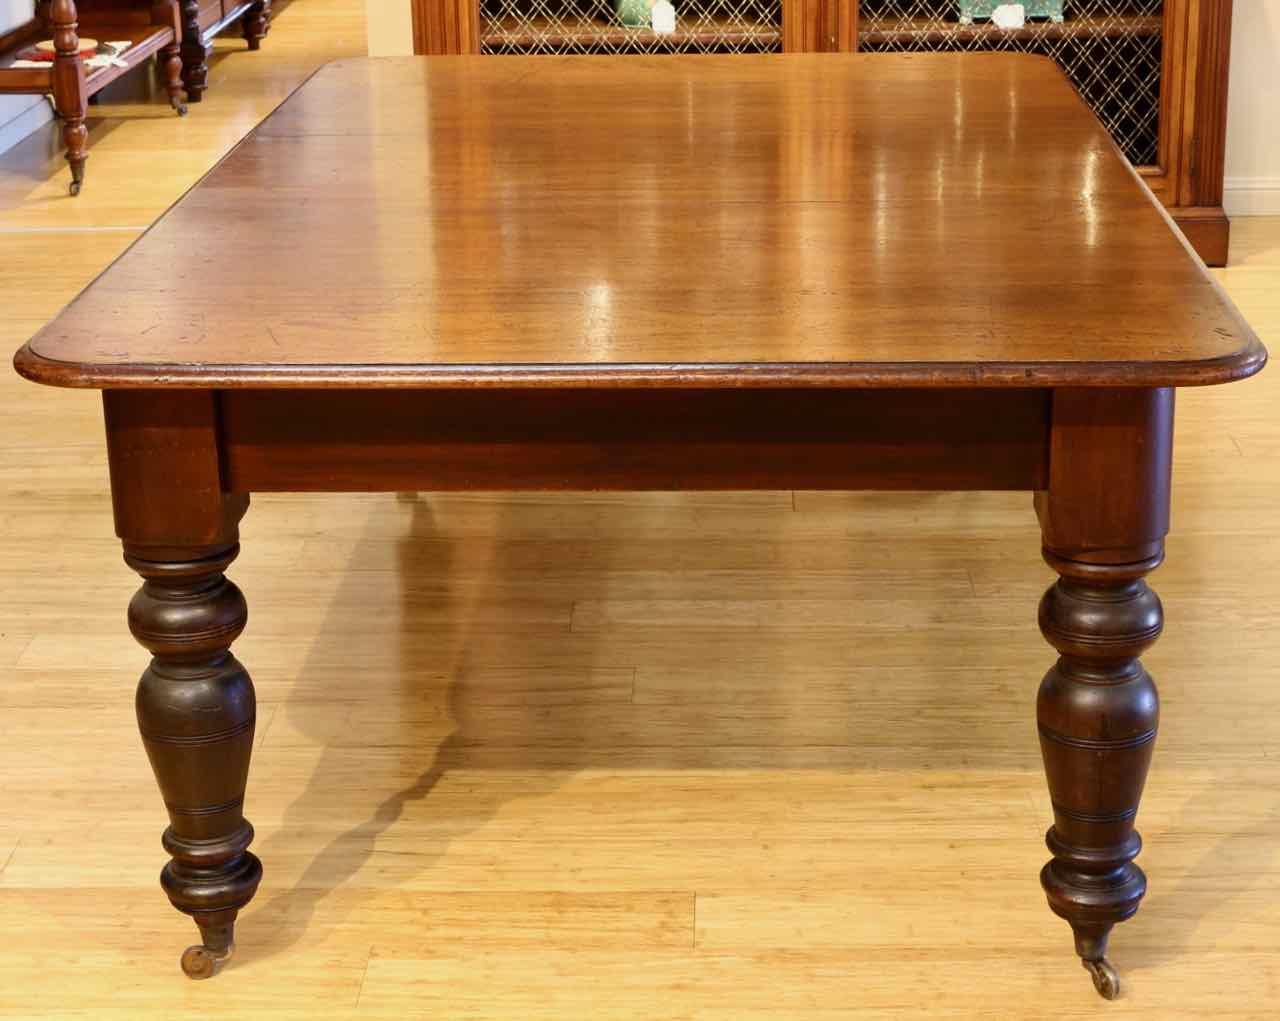 Antique Australian Cedar Dining Table The Merchant Of Welby